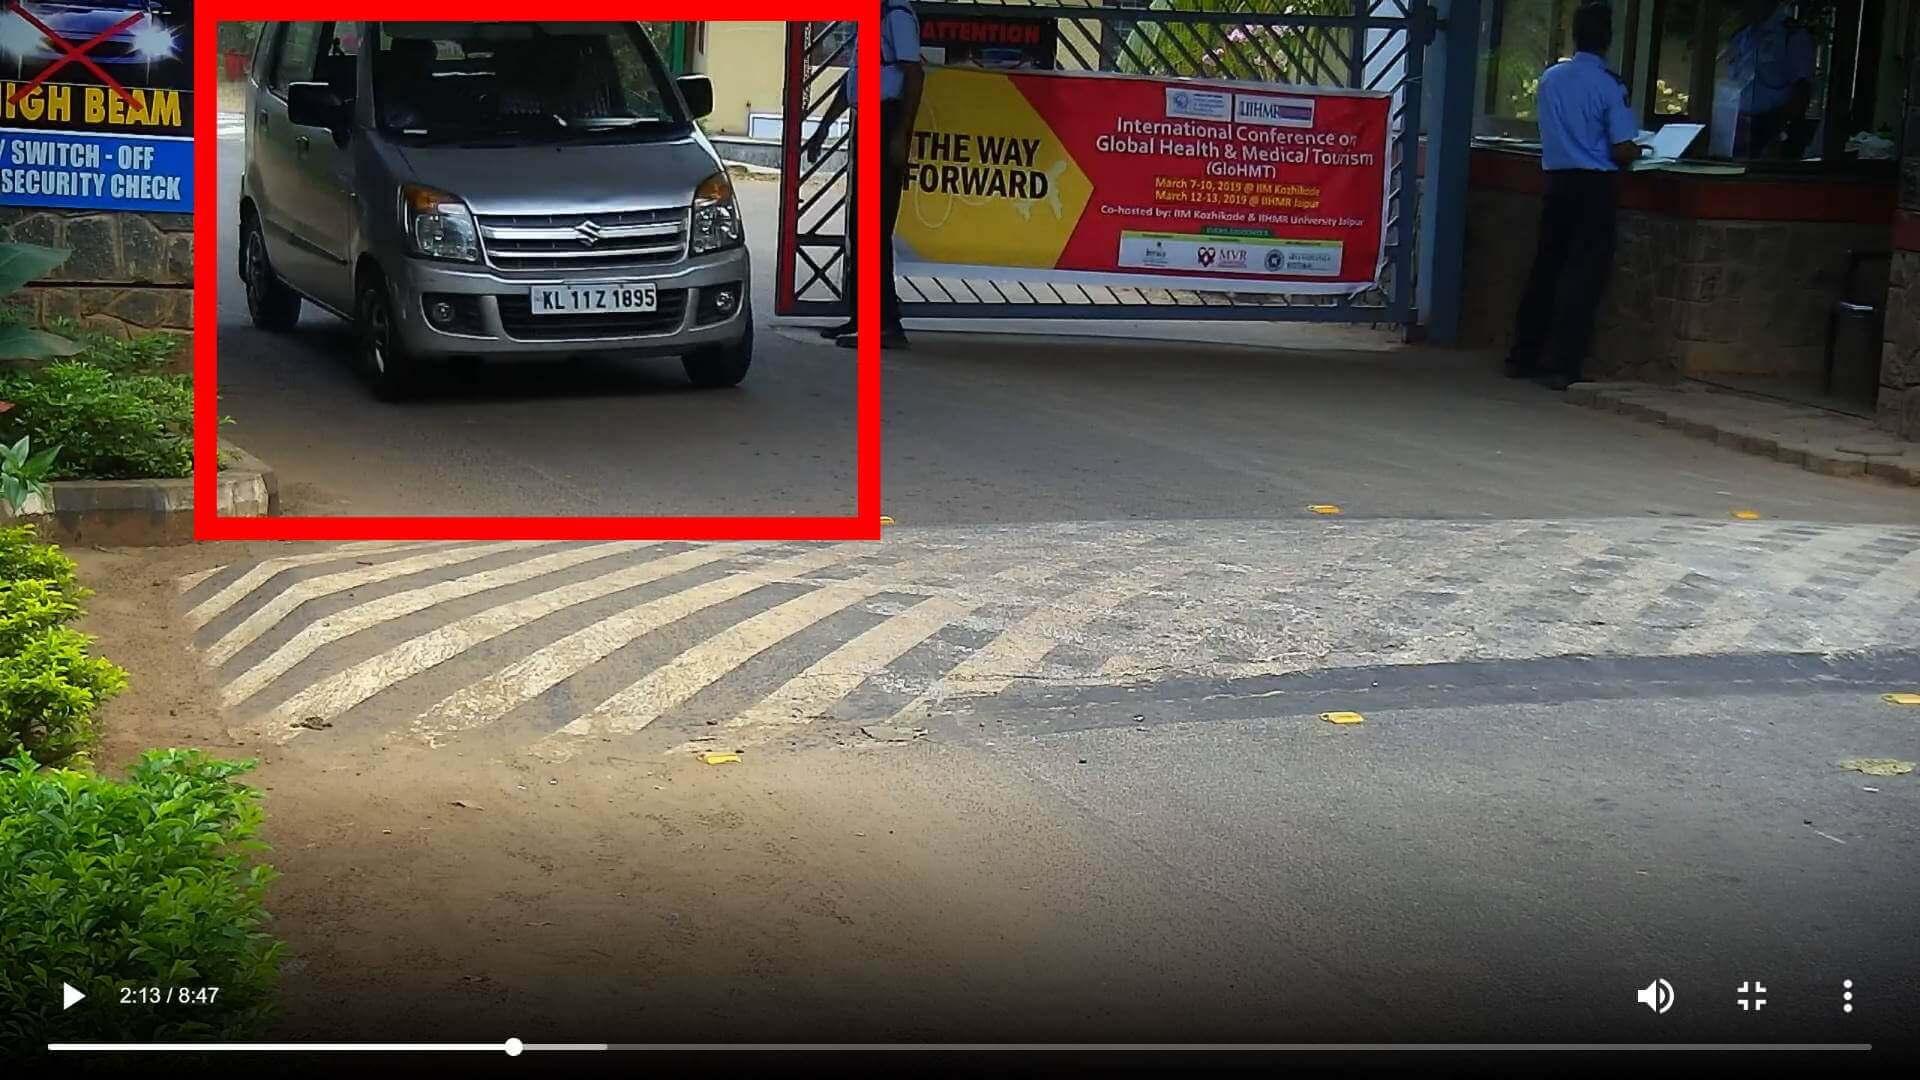 ANPR India Parking Management Camera Focus